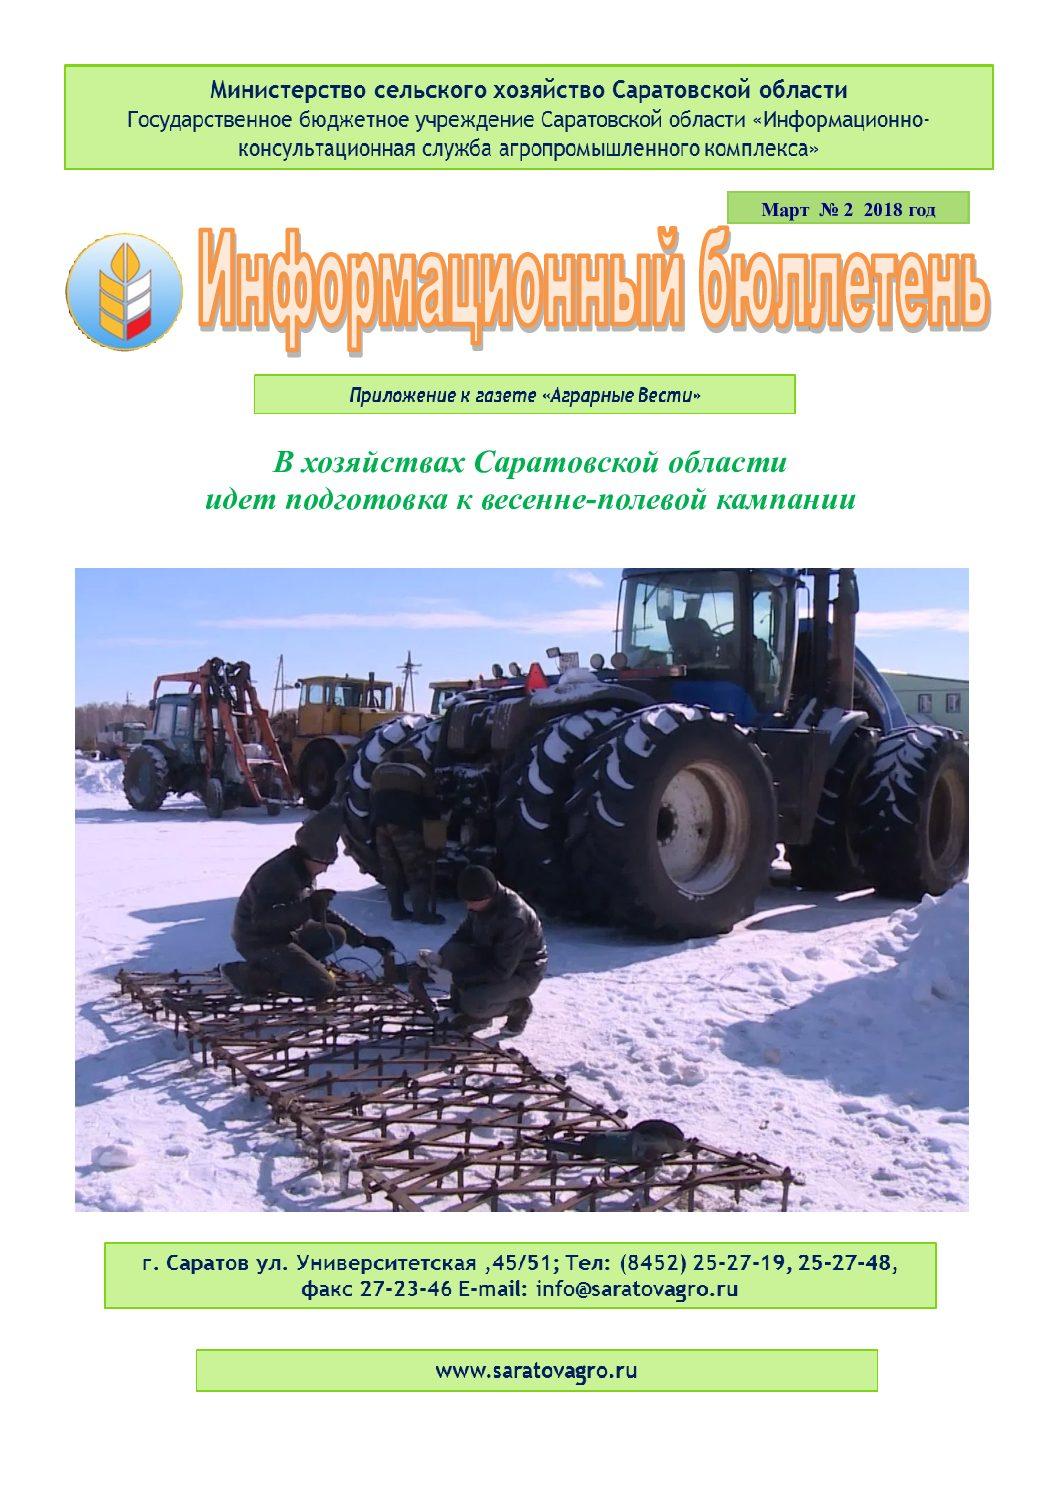 https://saratovagro.ru/wp-content/uploads/2020/08/2.2018-1-pdf.jpg